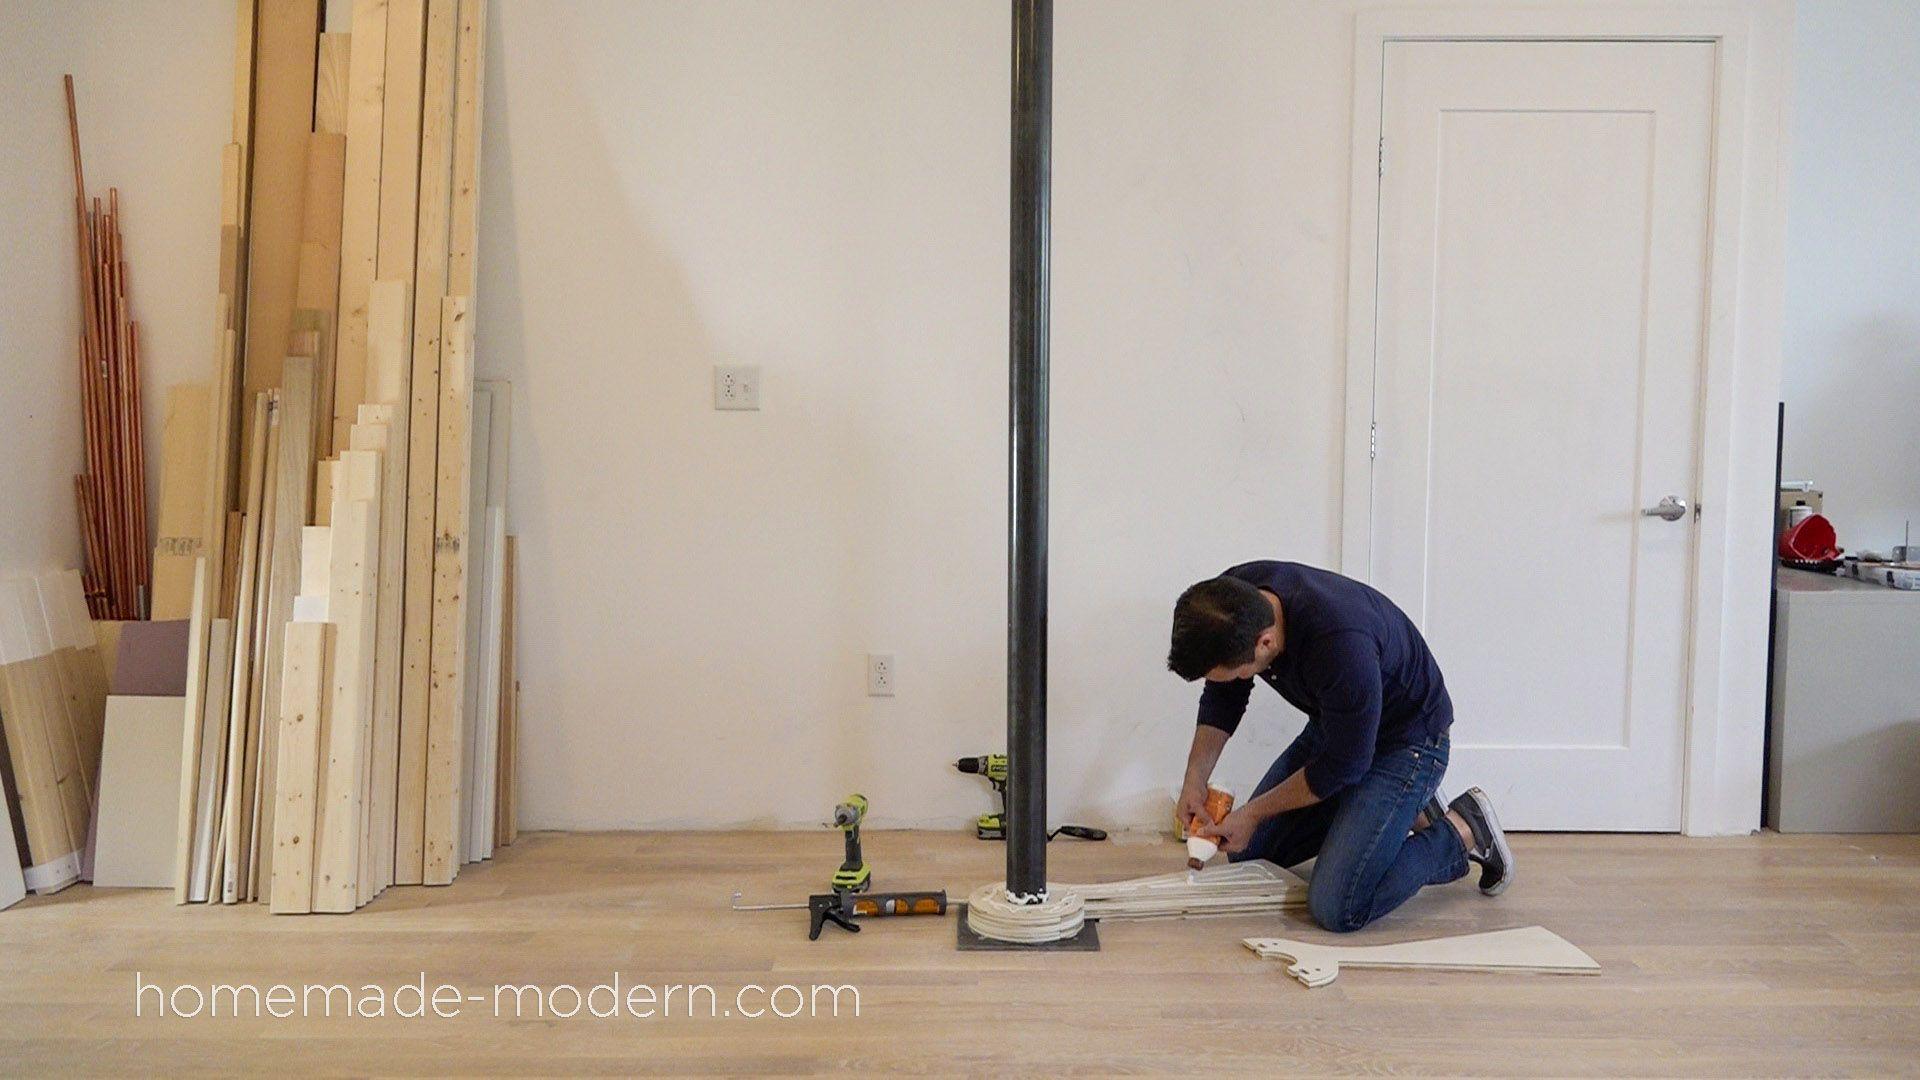 Best Homemade Modern Diy Ep99 Diy Cnc Spiral Staircase Σκάλες 640 x 480